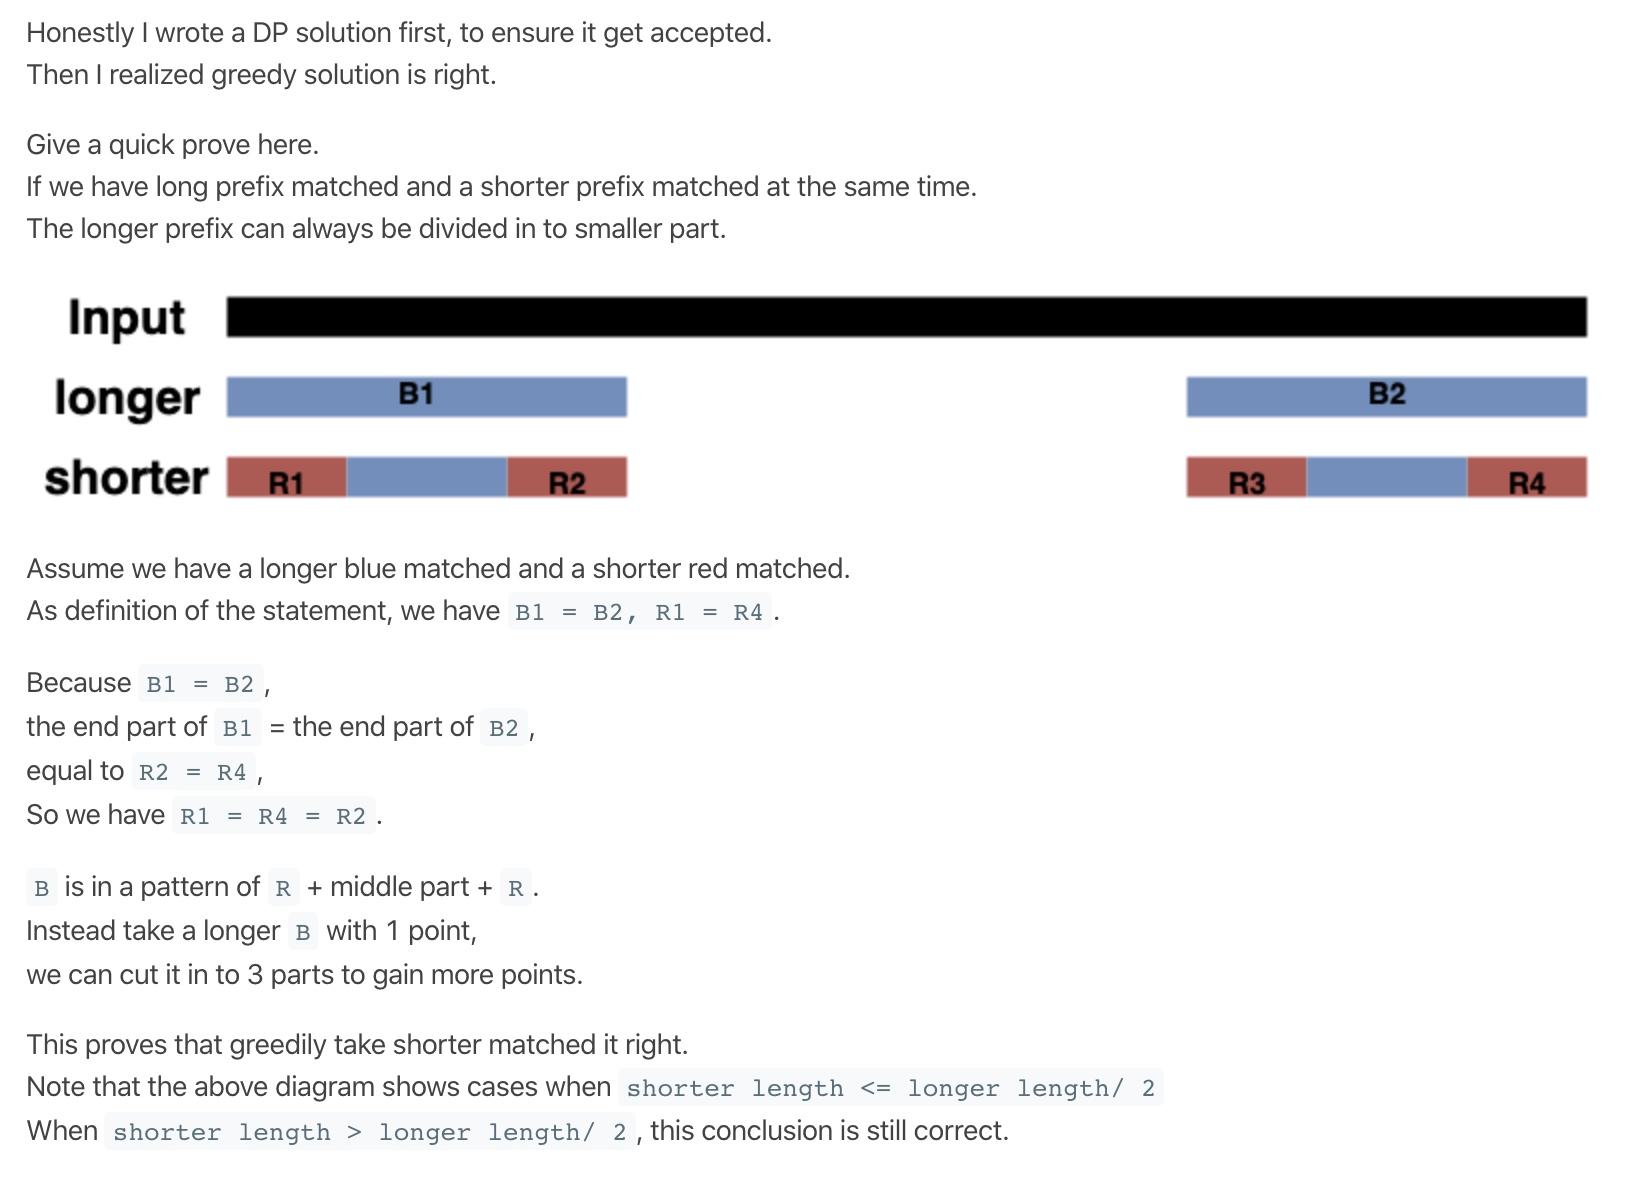 longest-chunked-palindrome-decomposition-greedy-3d9751ed-53ed-4e79-9abc-98d2527fe388-1580659474835-27156828